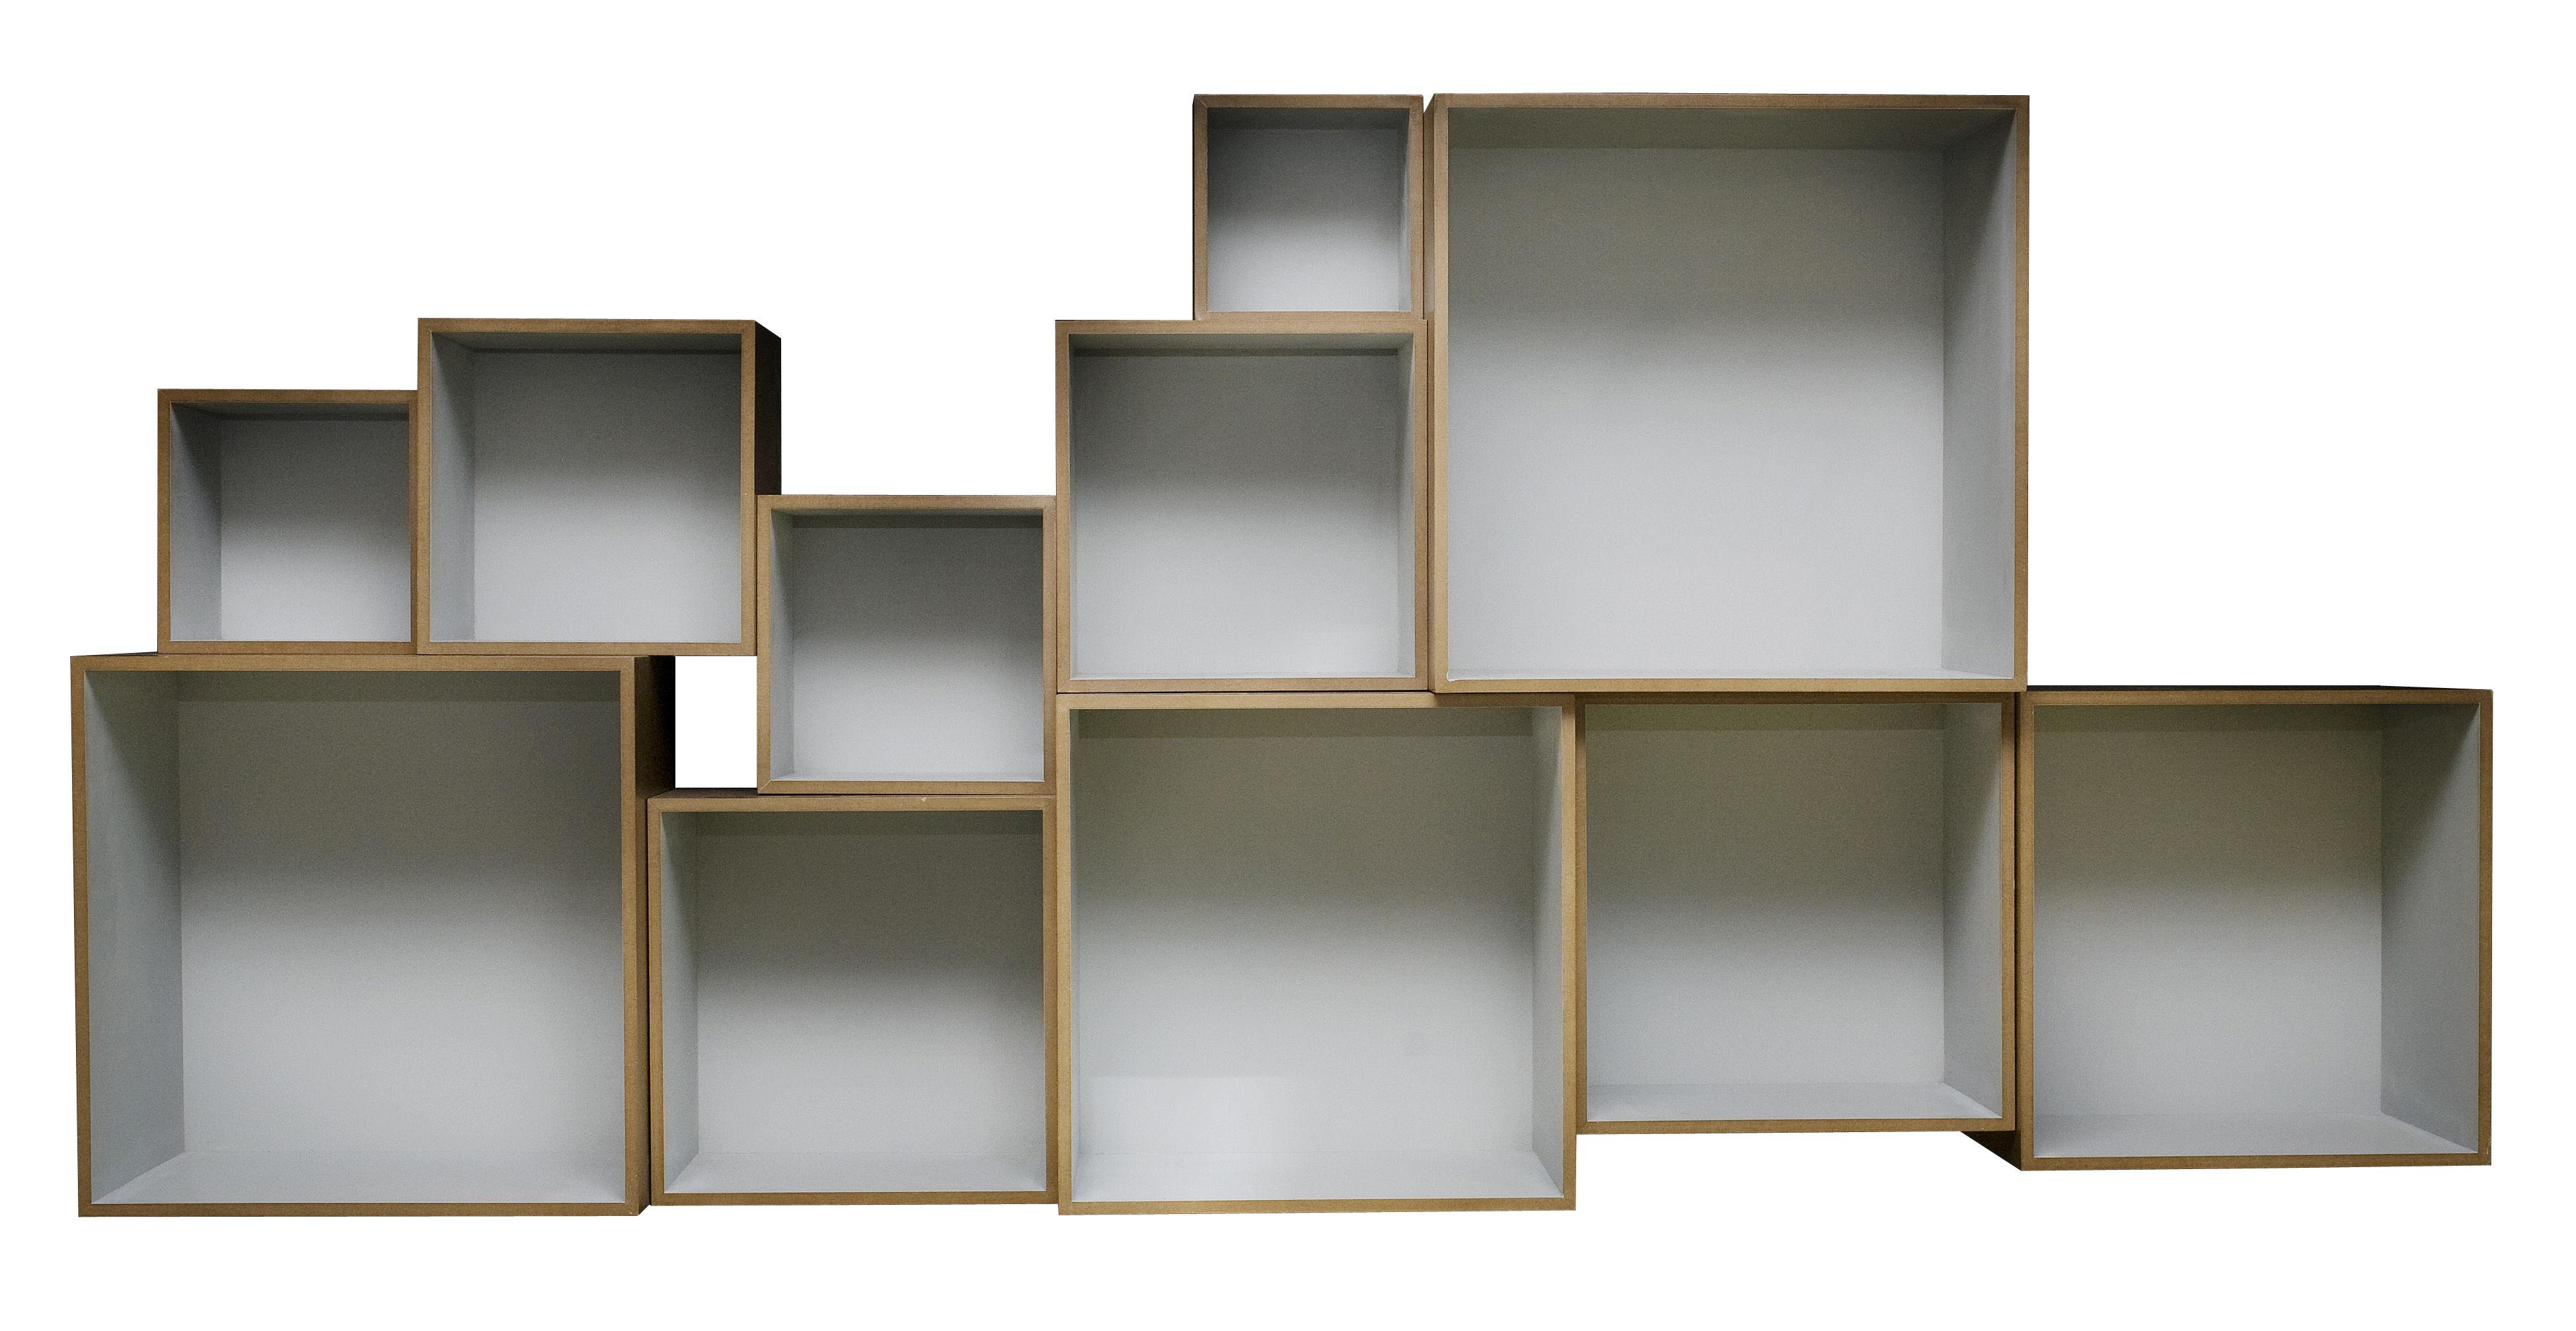 Etag re babushka modulable set de 11 modules ext naturel int gris clair - Bloc etagere modulable ...